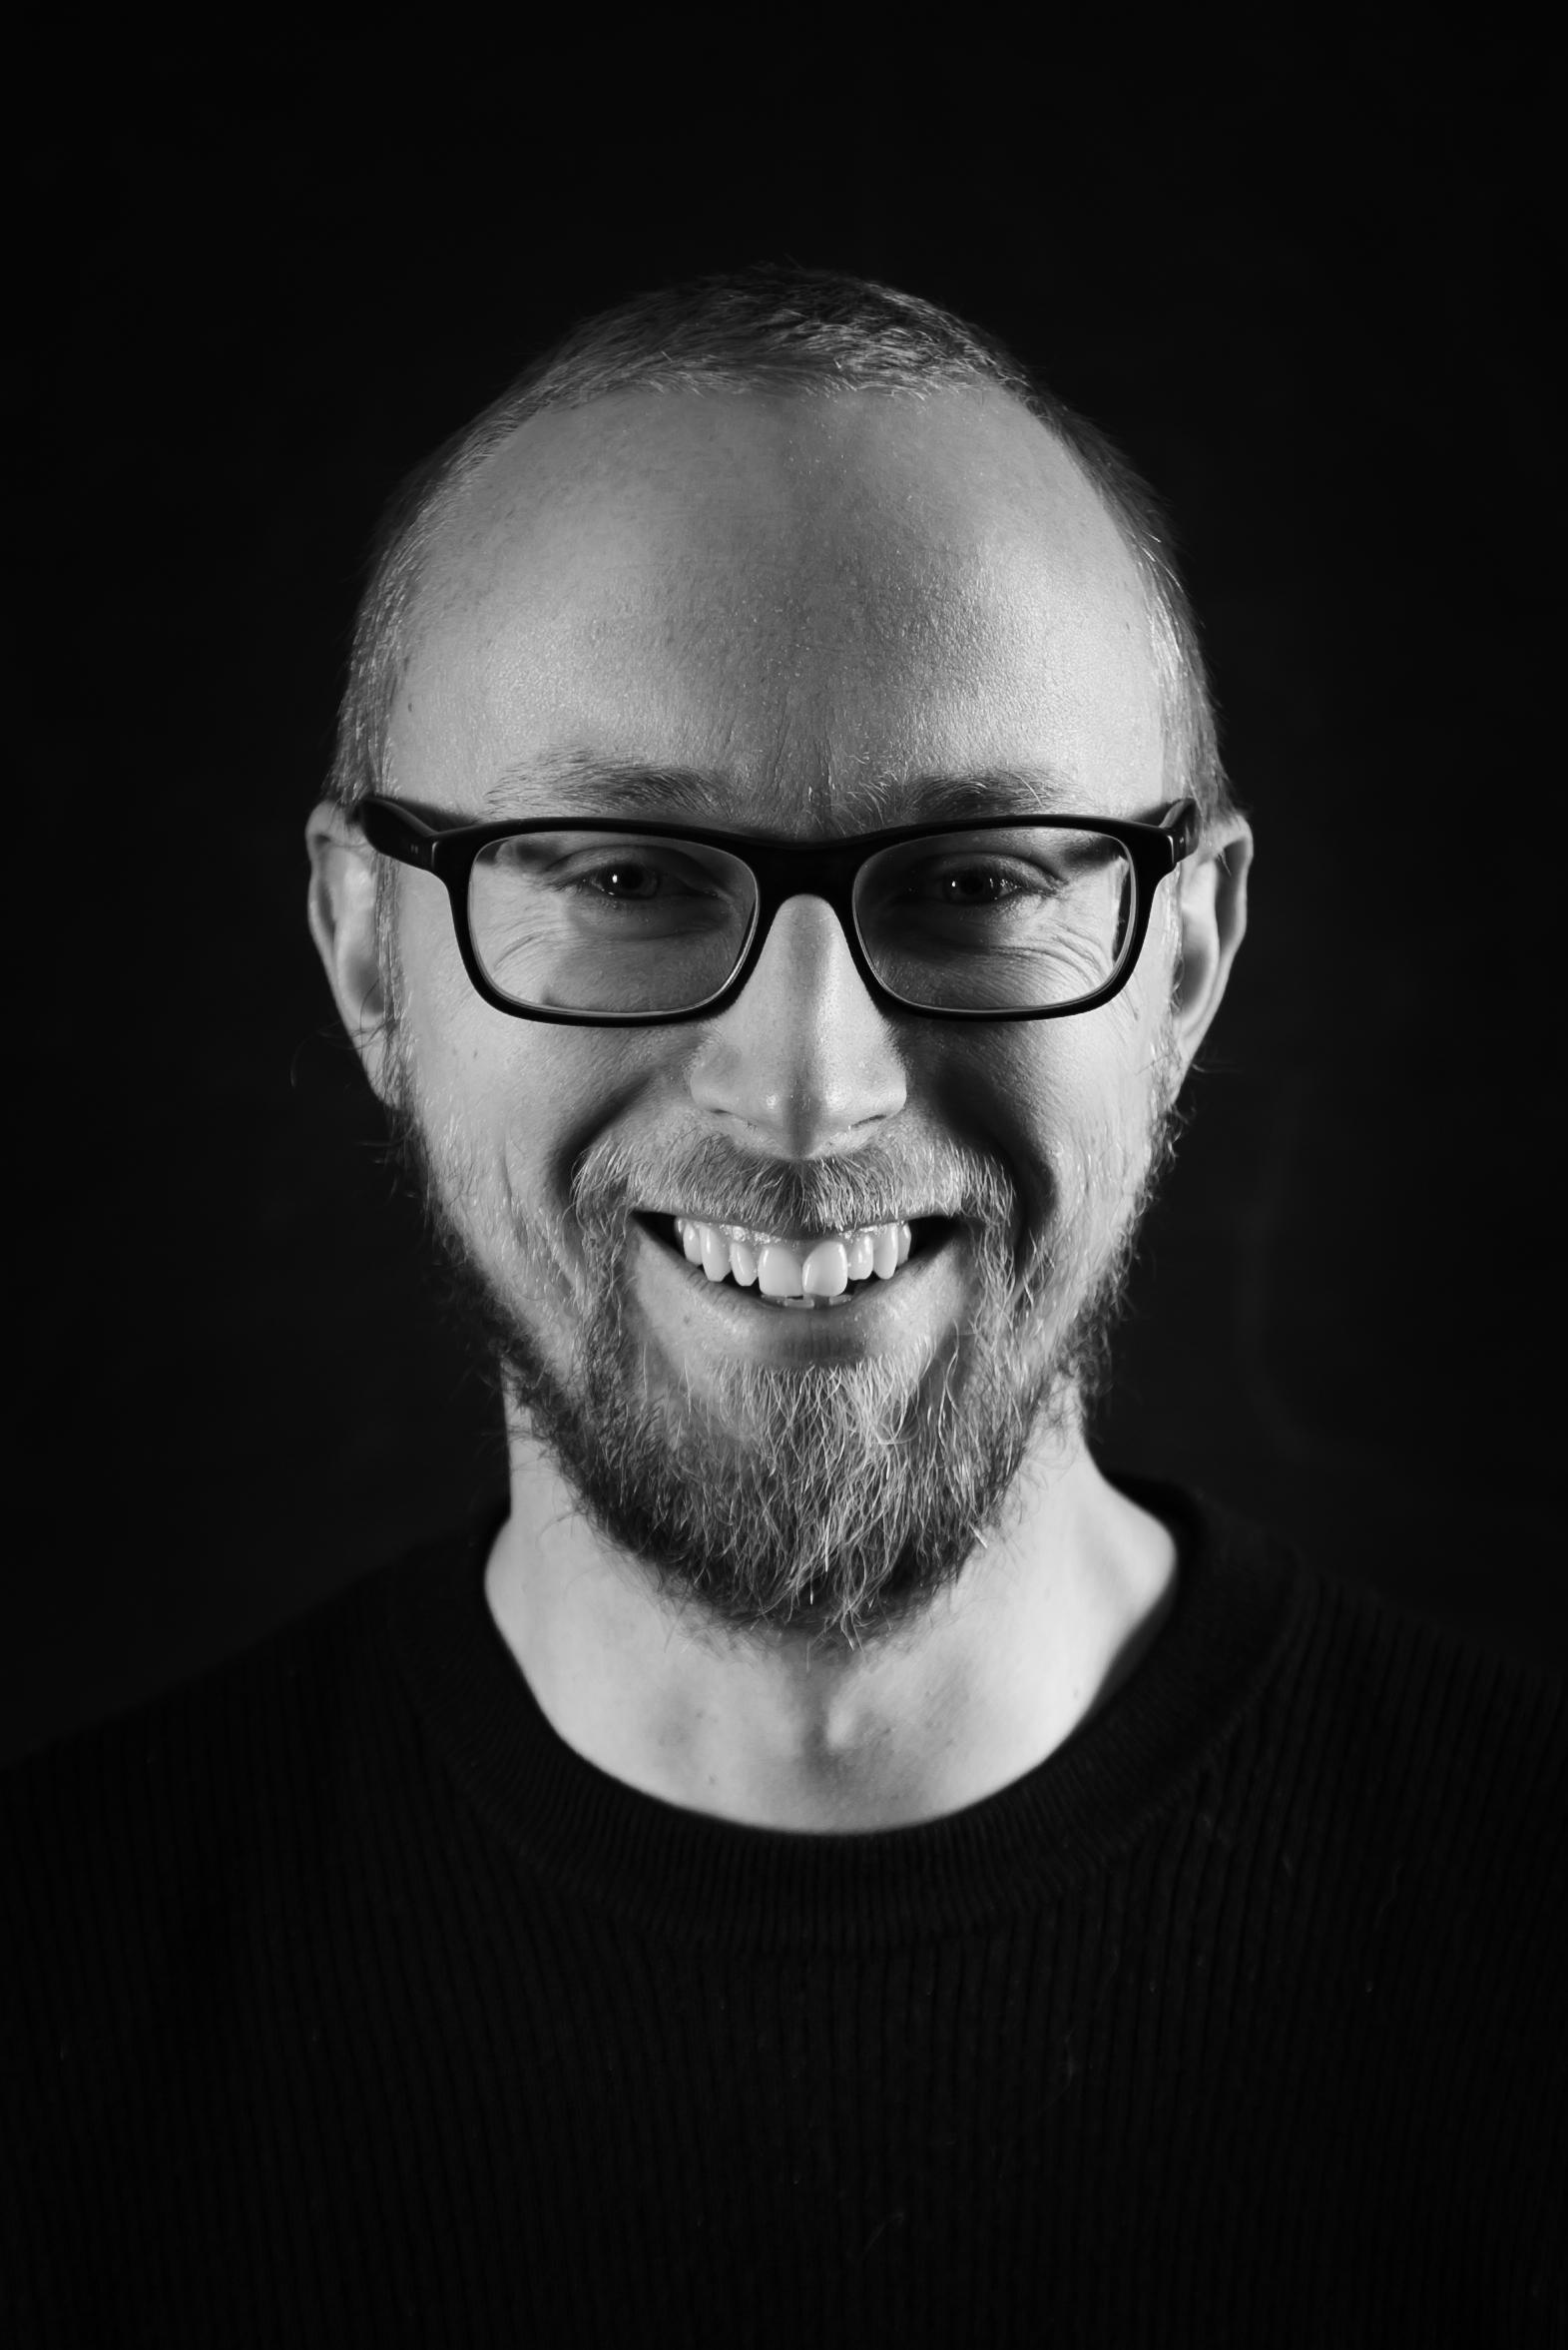 Magnus Gaarde - Head of Designmagnus@2kdenmark.com